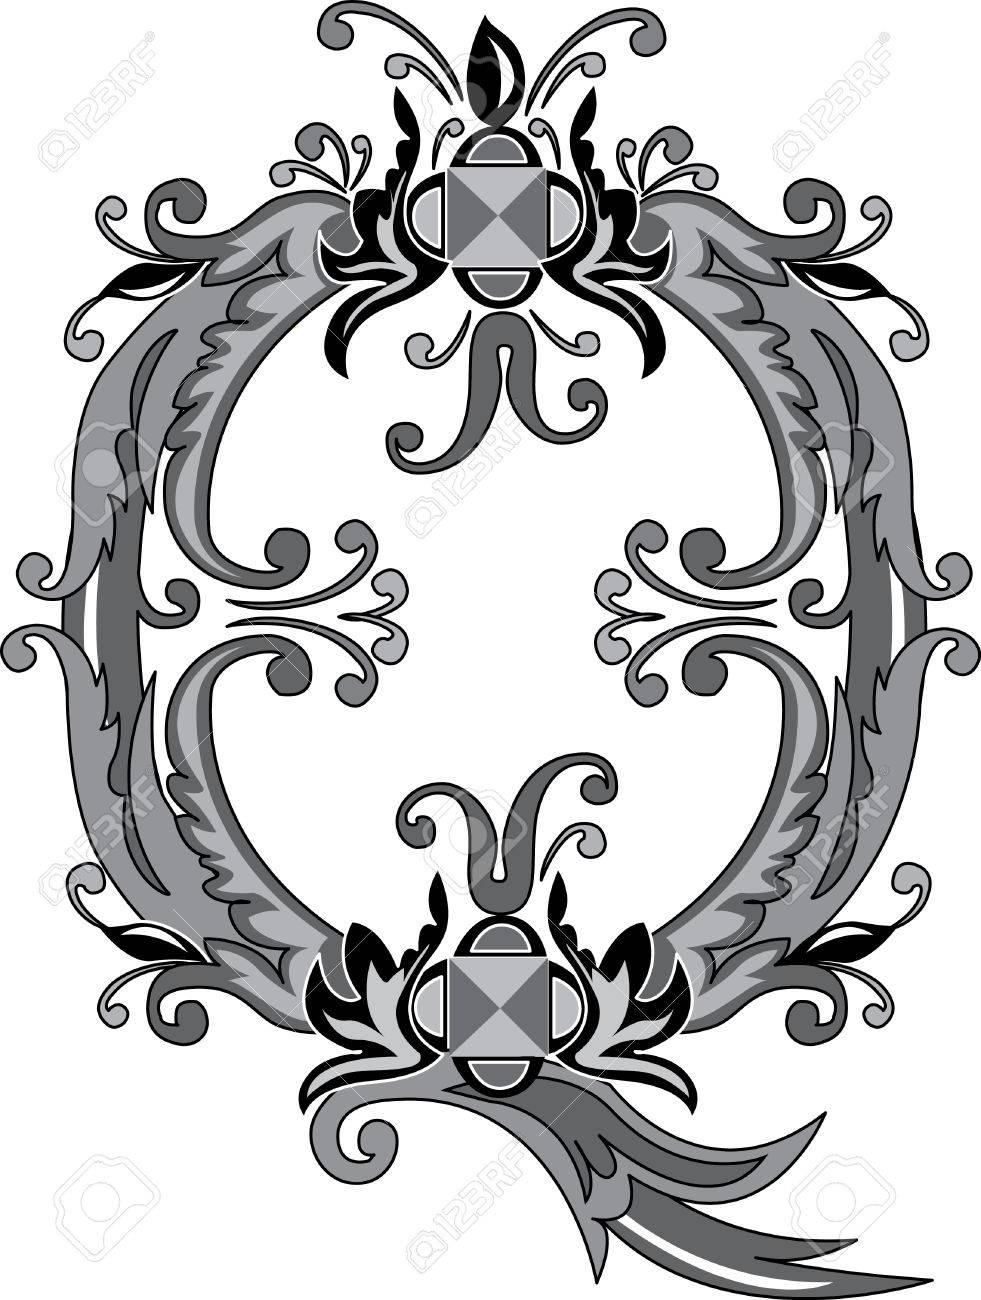 Foliage English Alphabet Letter Q Black And White Royalty Free